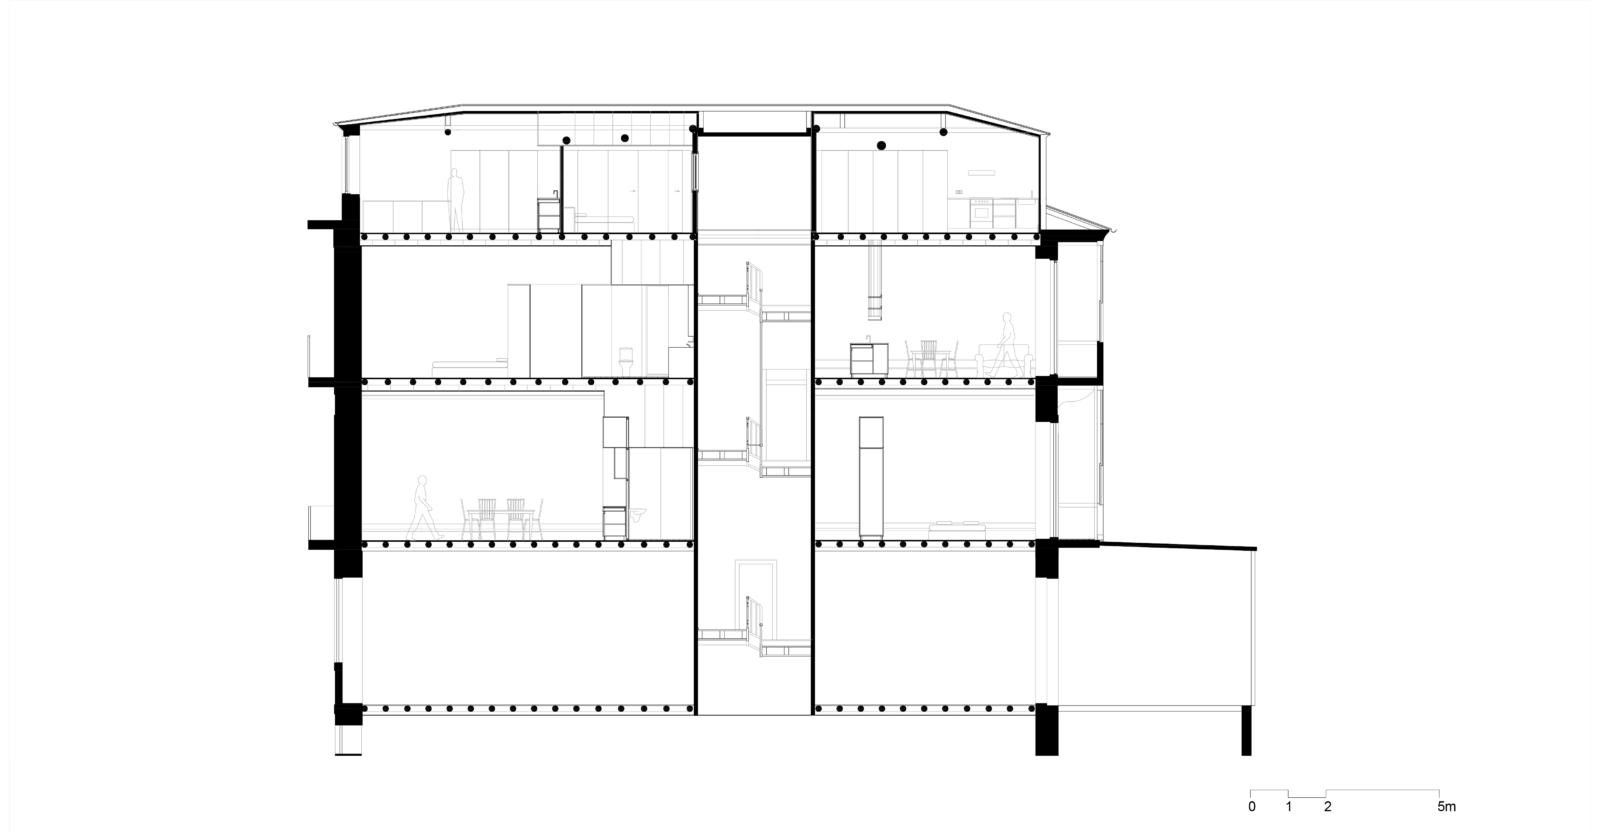 Corte longitudinal 2